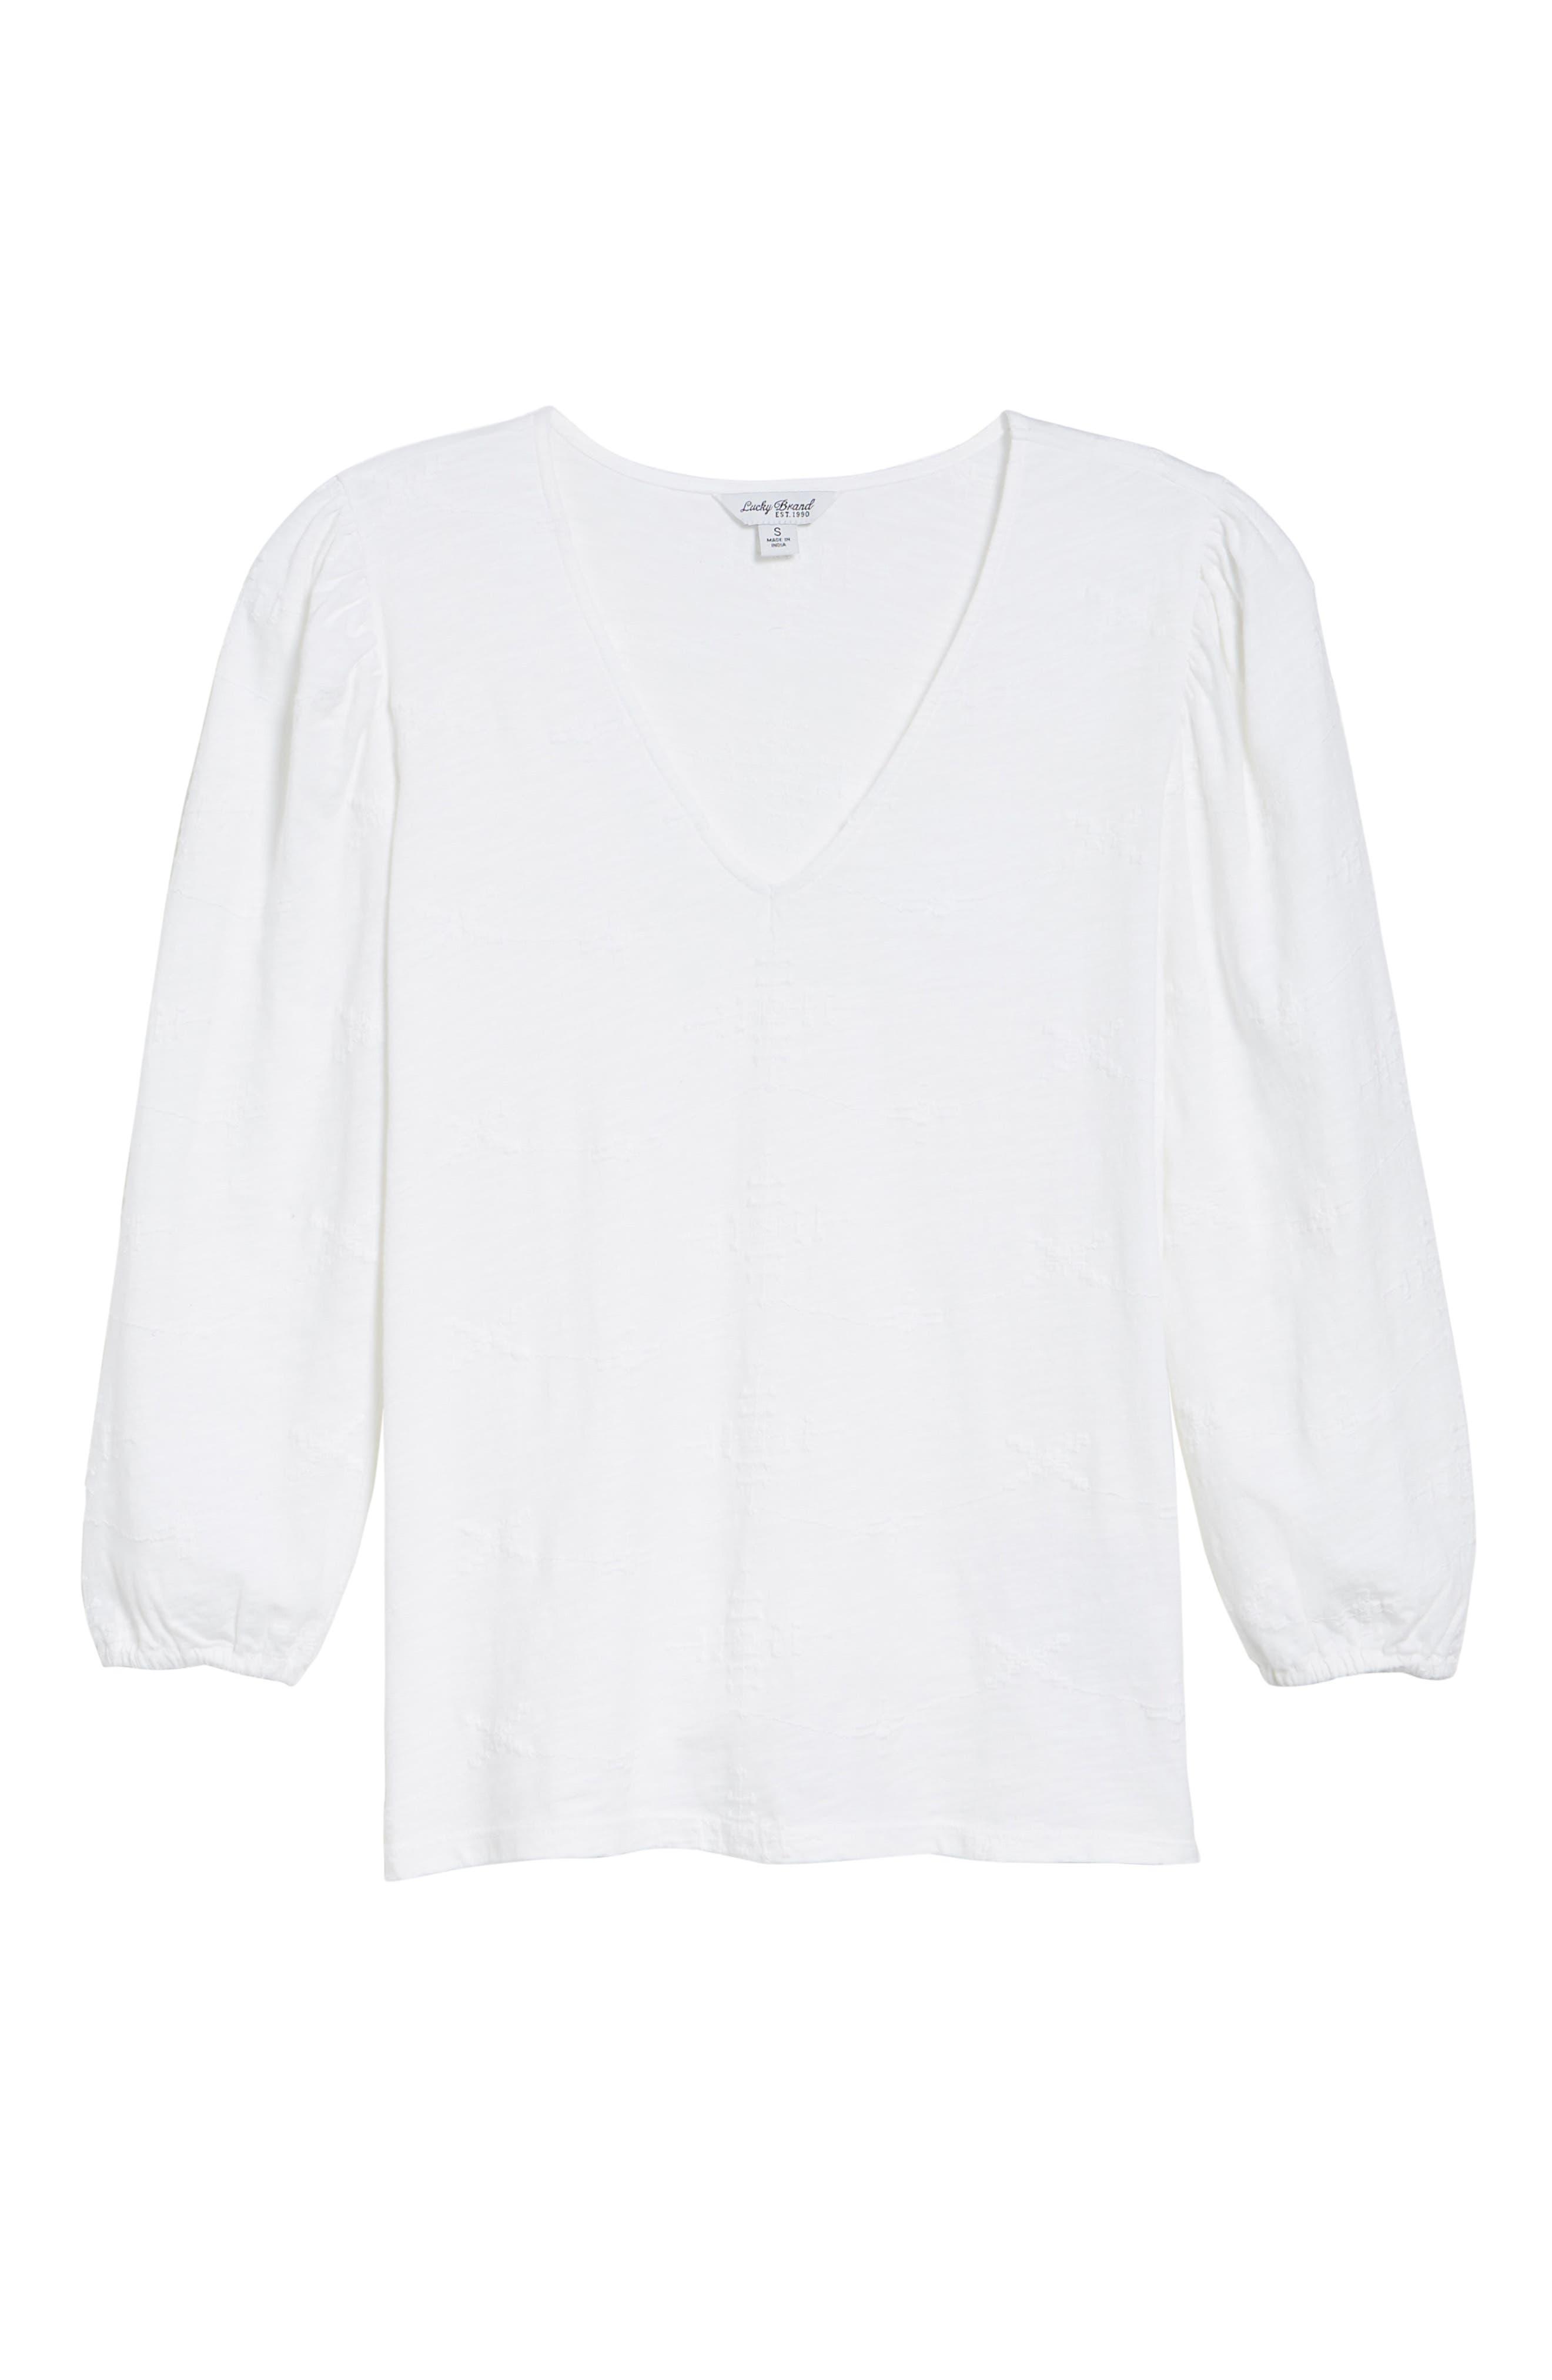 Eyelet Knit Top,                             Alternate thumbnail 7, color,                             Lucky White